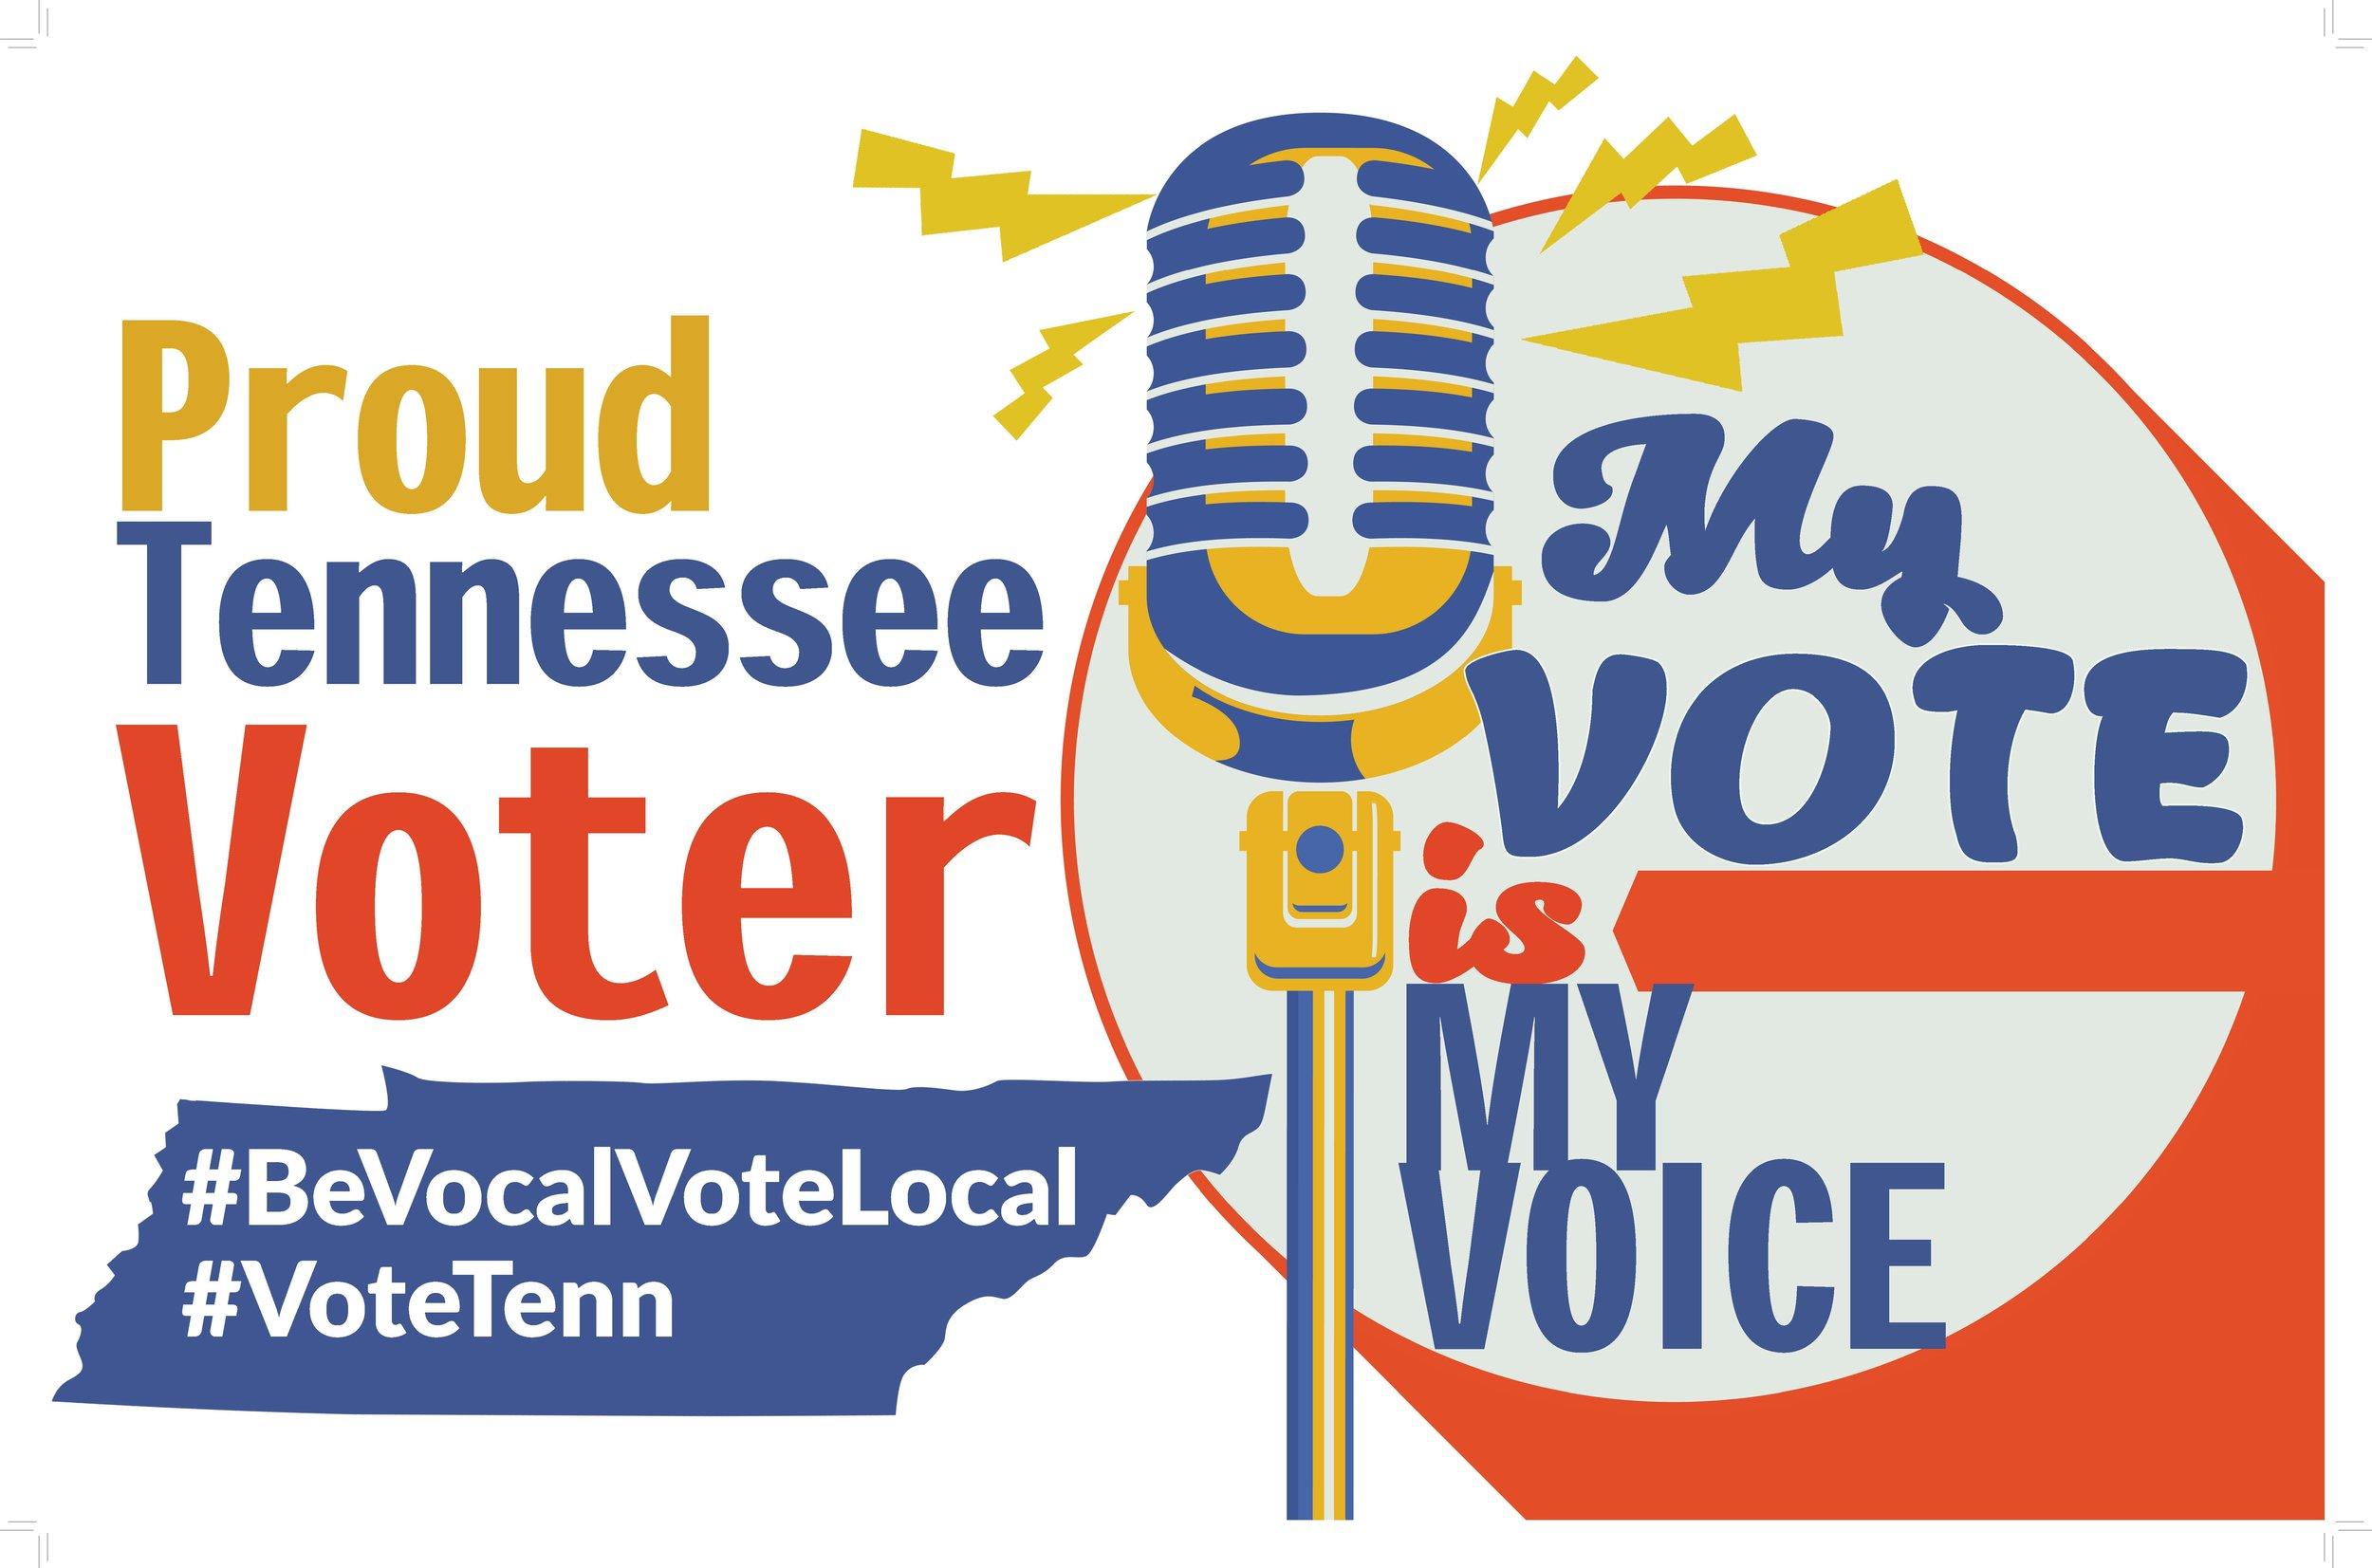 #VoteTenn Voice Vote.jpg